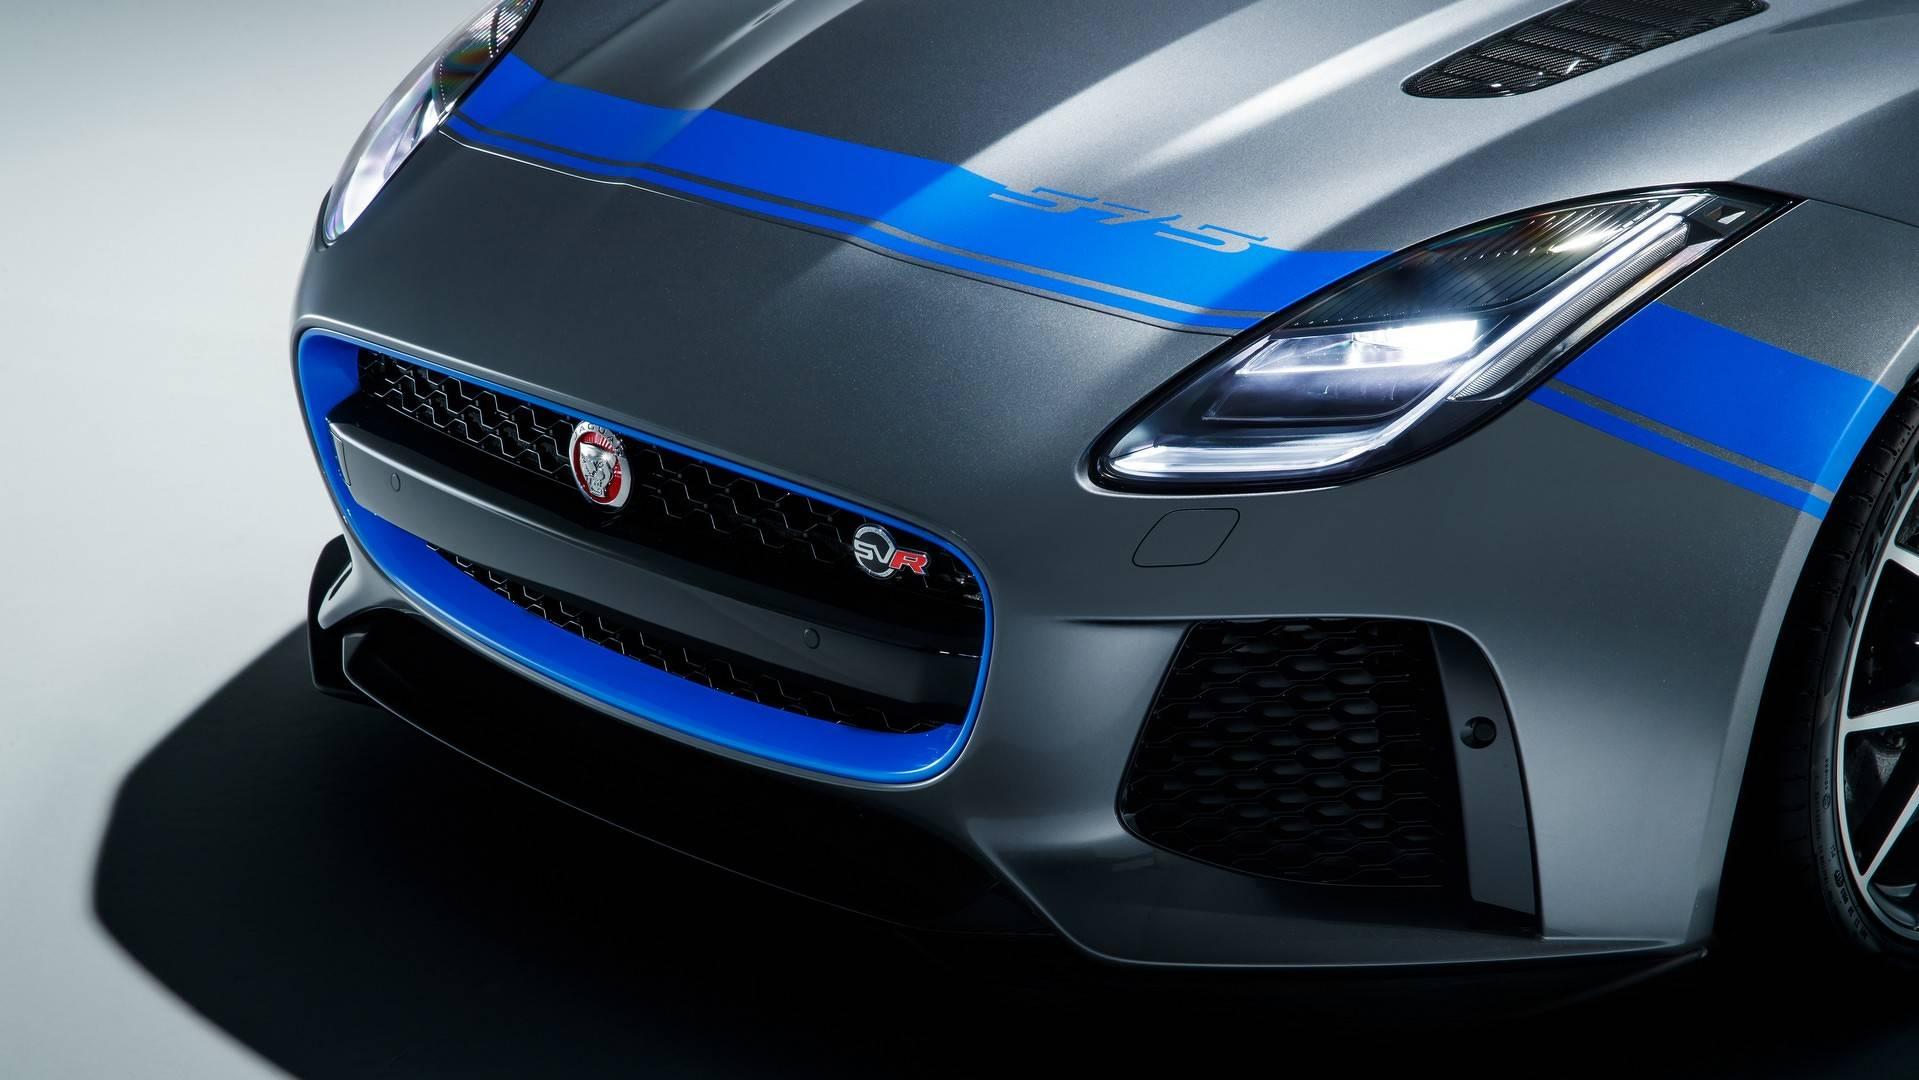 Svr Graphic Pack Is Go For The 2018 Jaguar F Type Svr Autoevolution